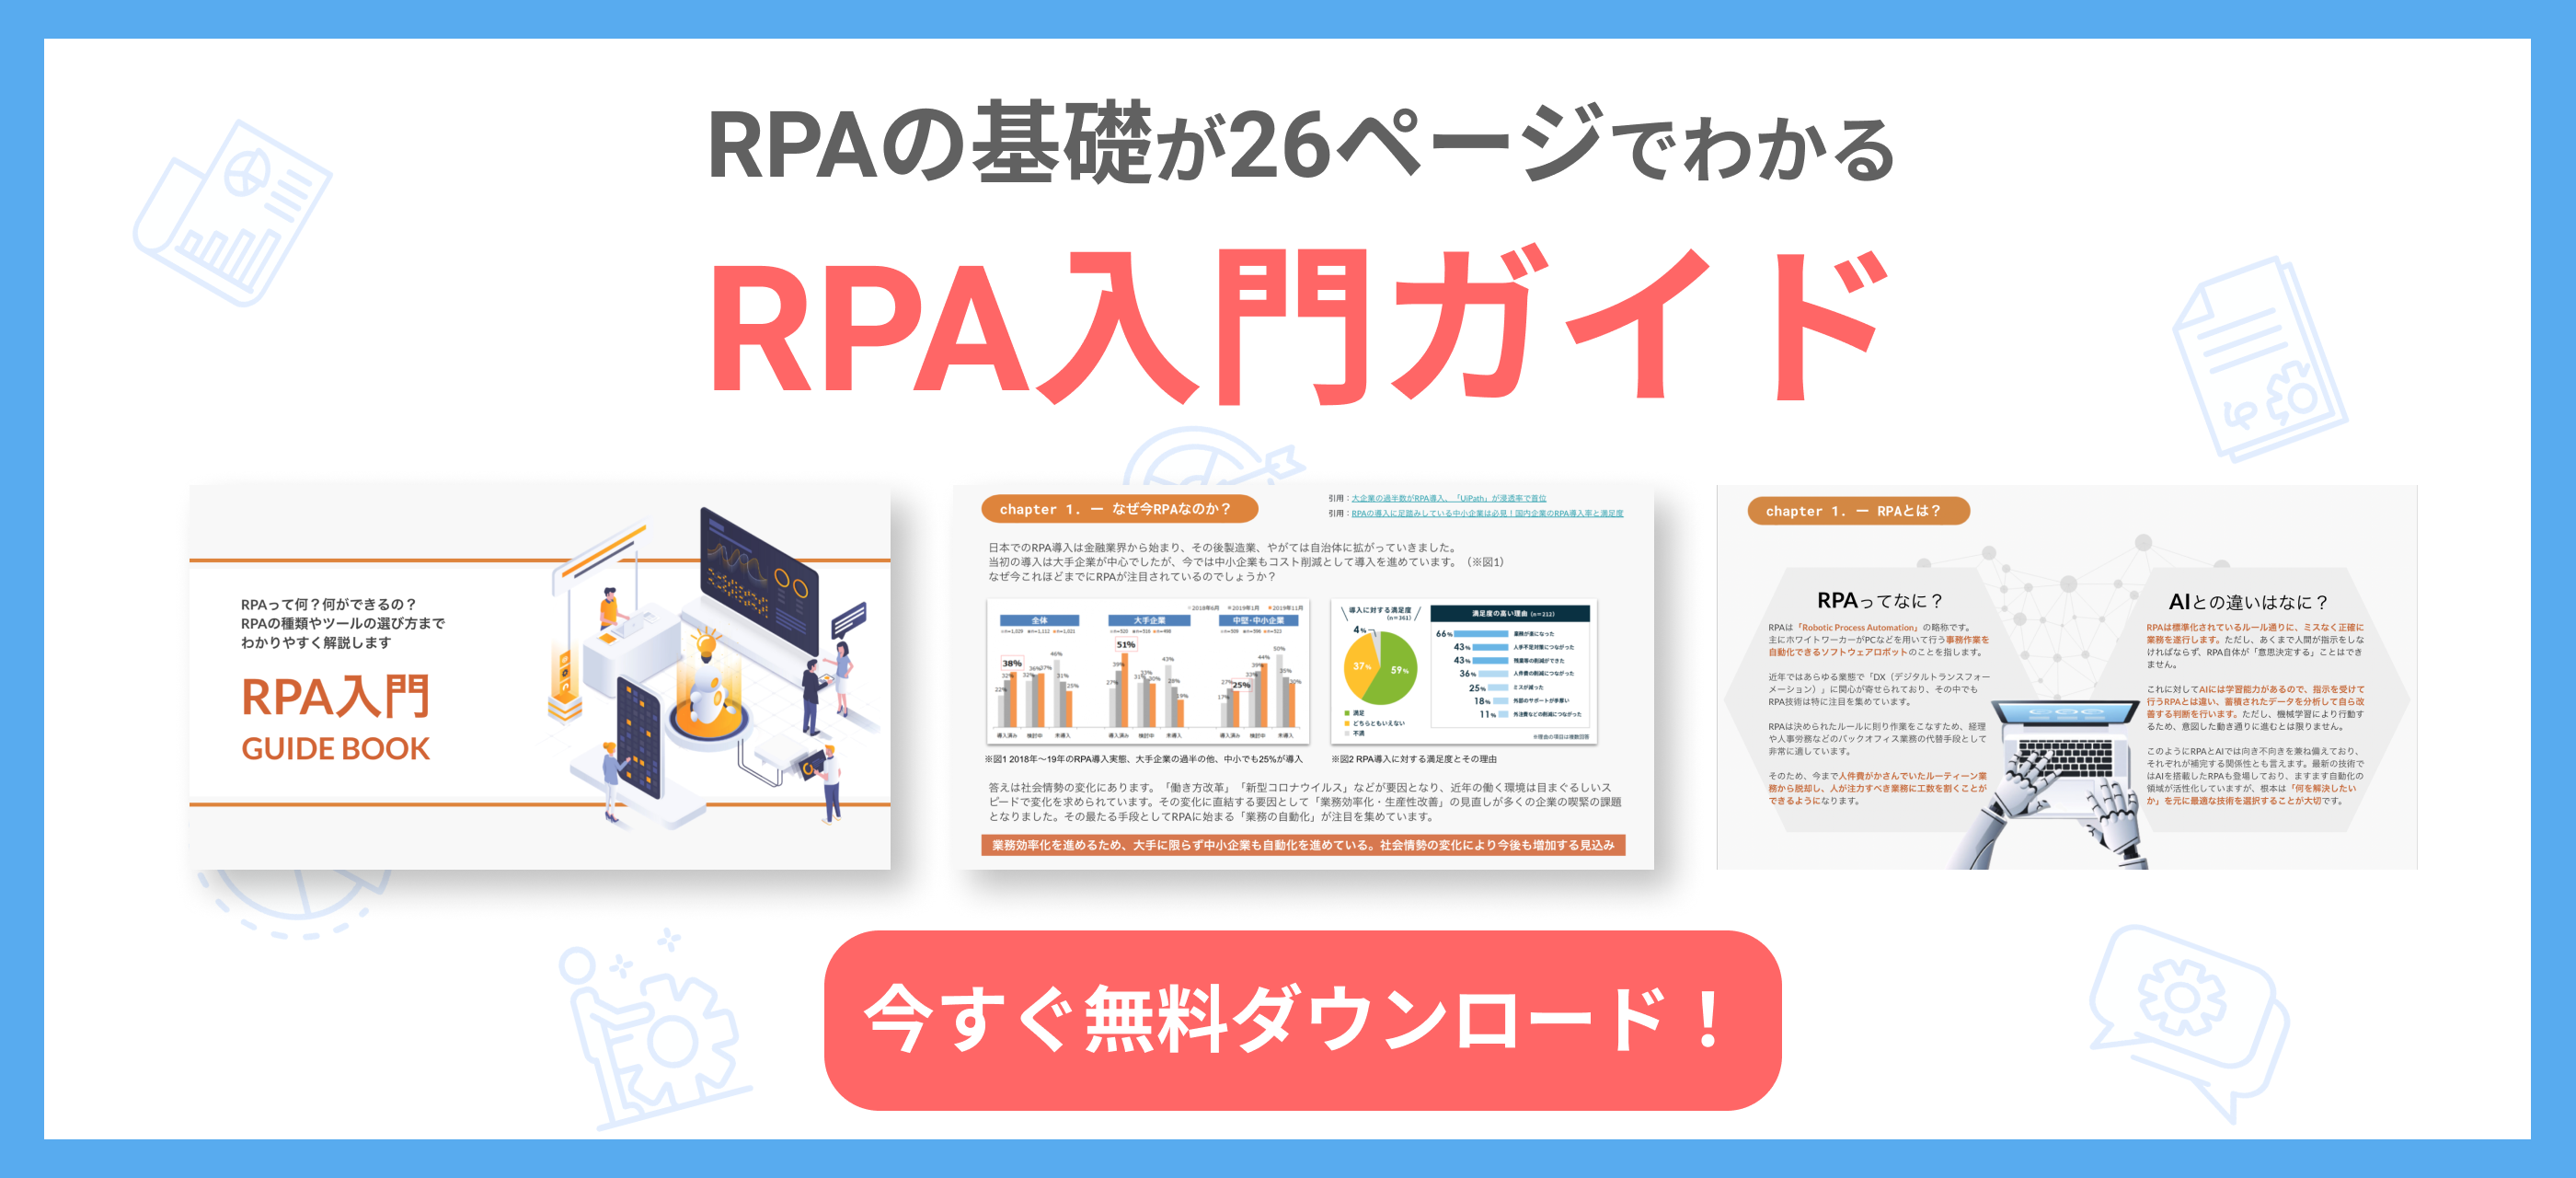 RPA入門ガイドダウンロードページへのバナー